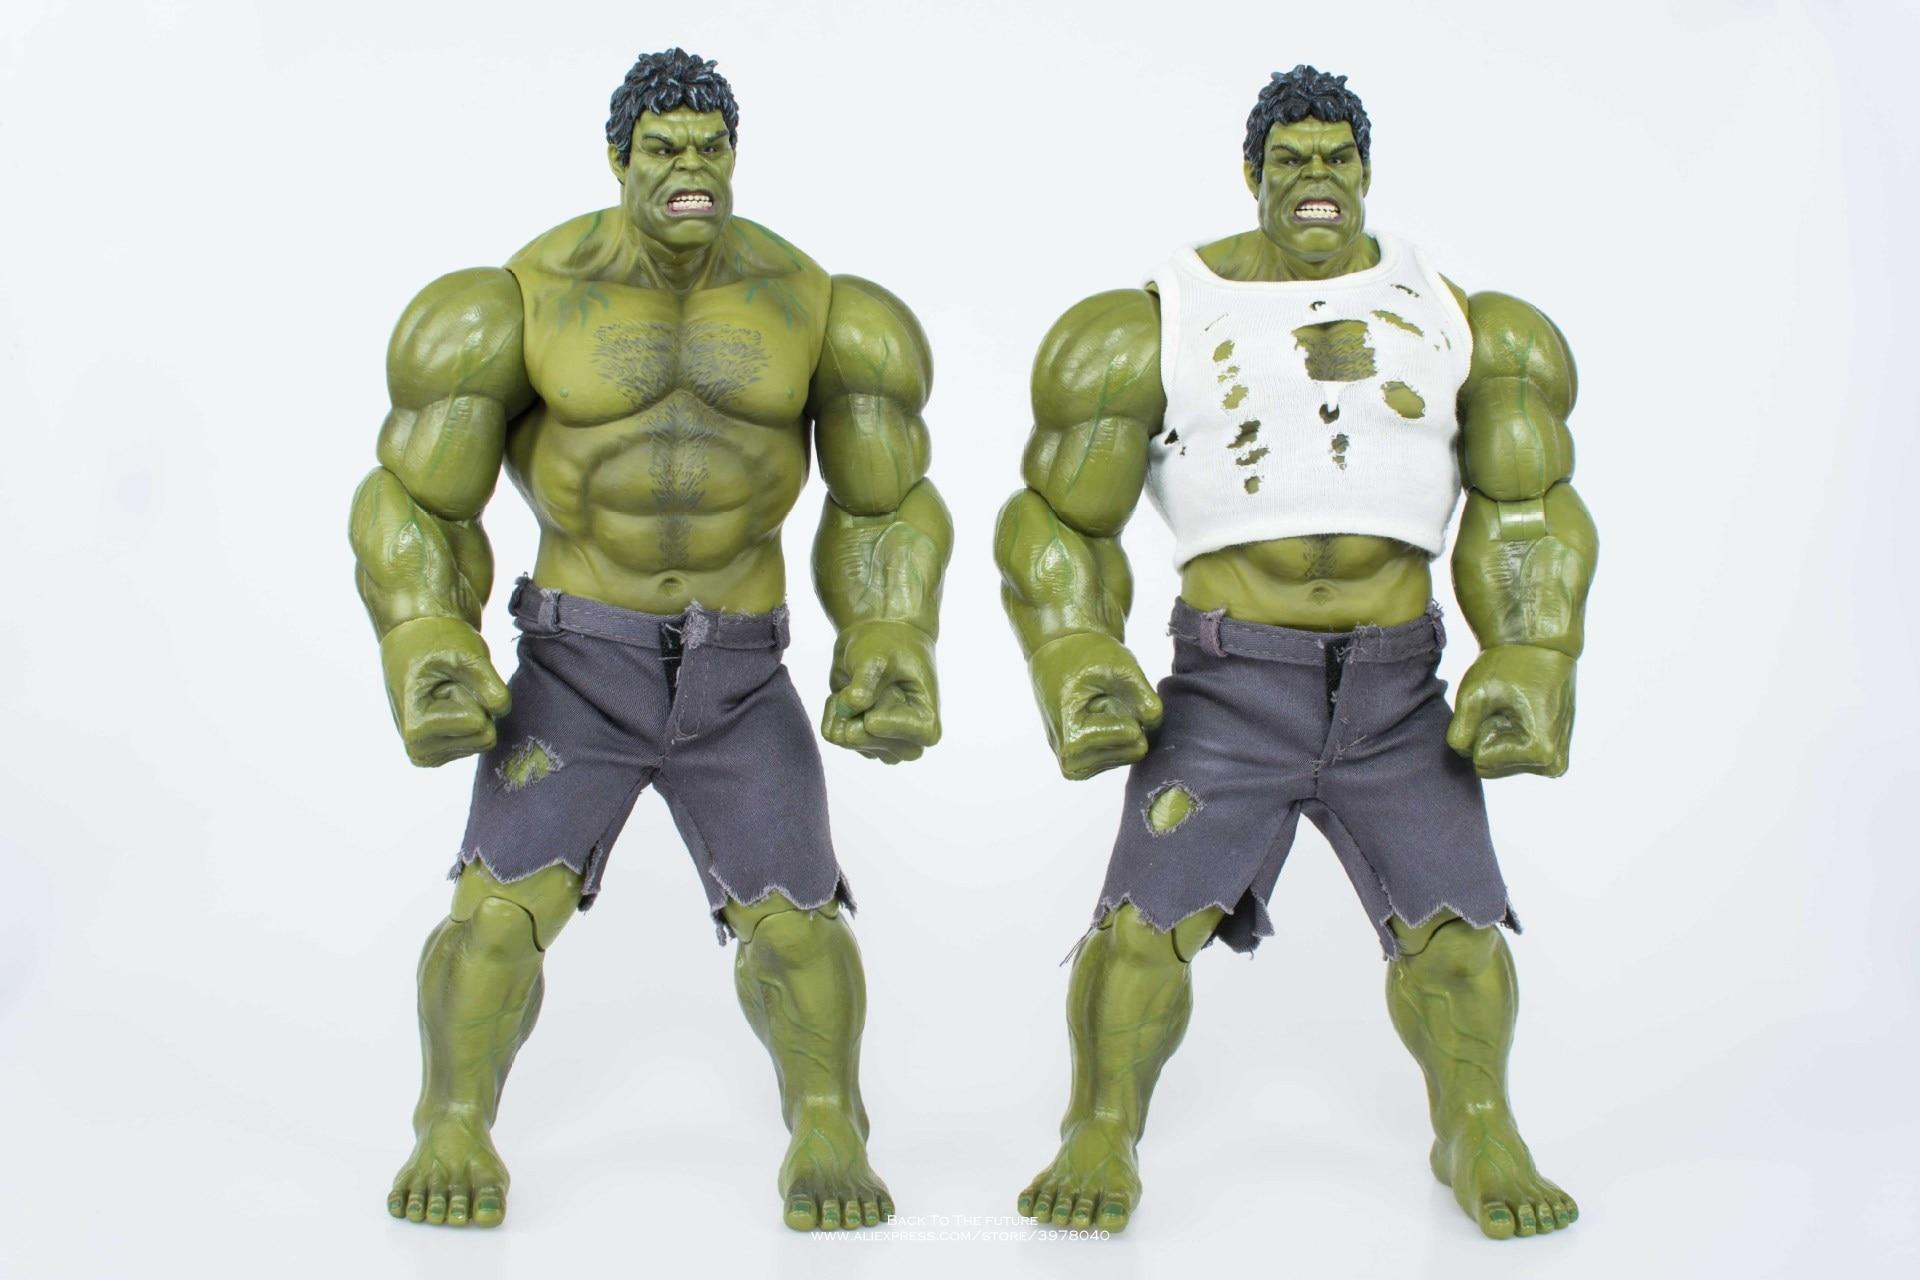 цена на Disney Marvel Avengers Super Hero Hulk 25cm Action Figure Anime Mini doll Decoration PVC Collection Figurine Toy model children